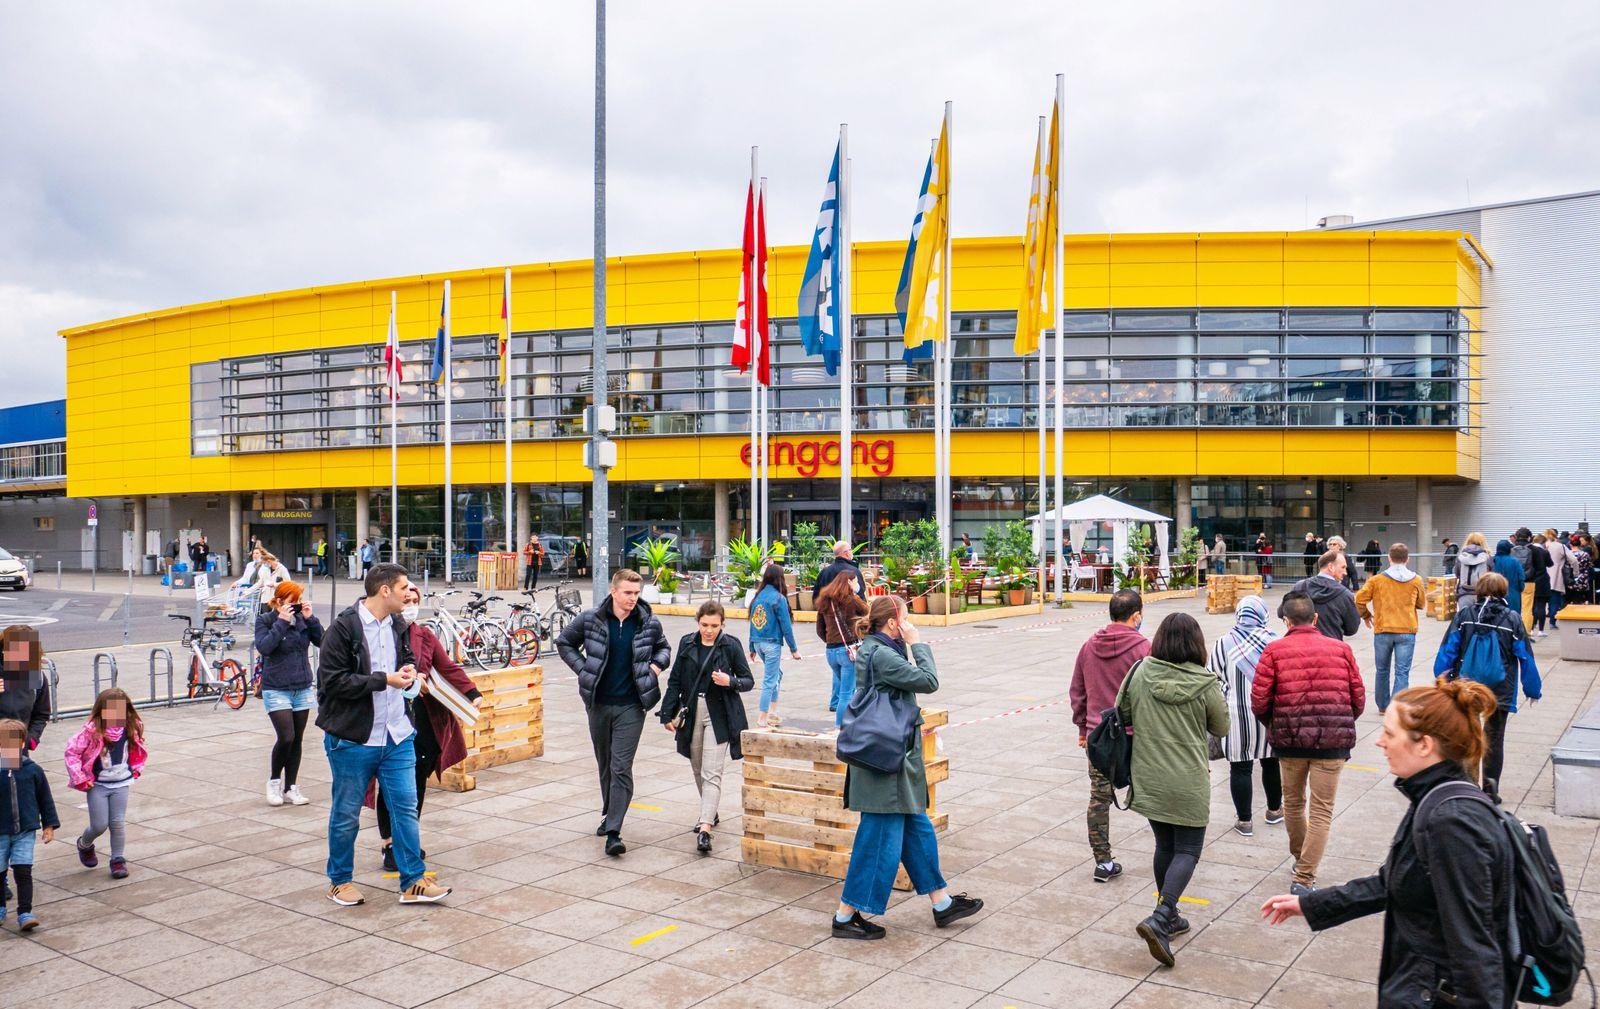 25.05.2020,Berlin,Deutschland,GER, die Stadt in Zeiten der Corona Pandemie.IKEA Filiale Tempelhof. *** 25 05 2020,Berli